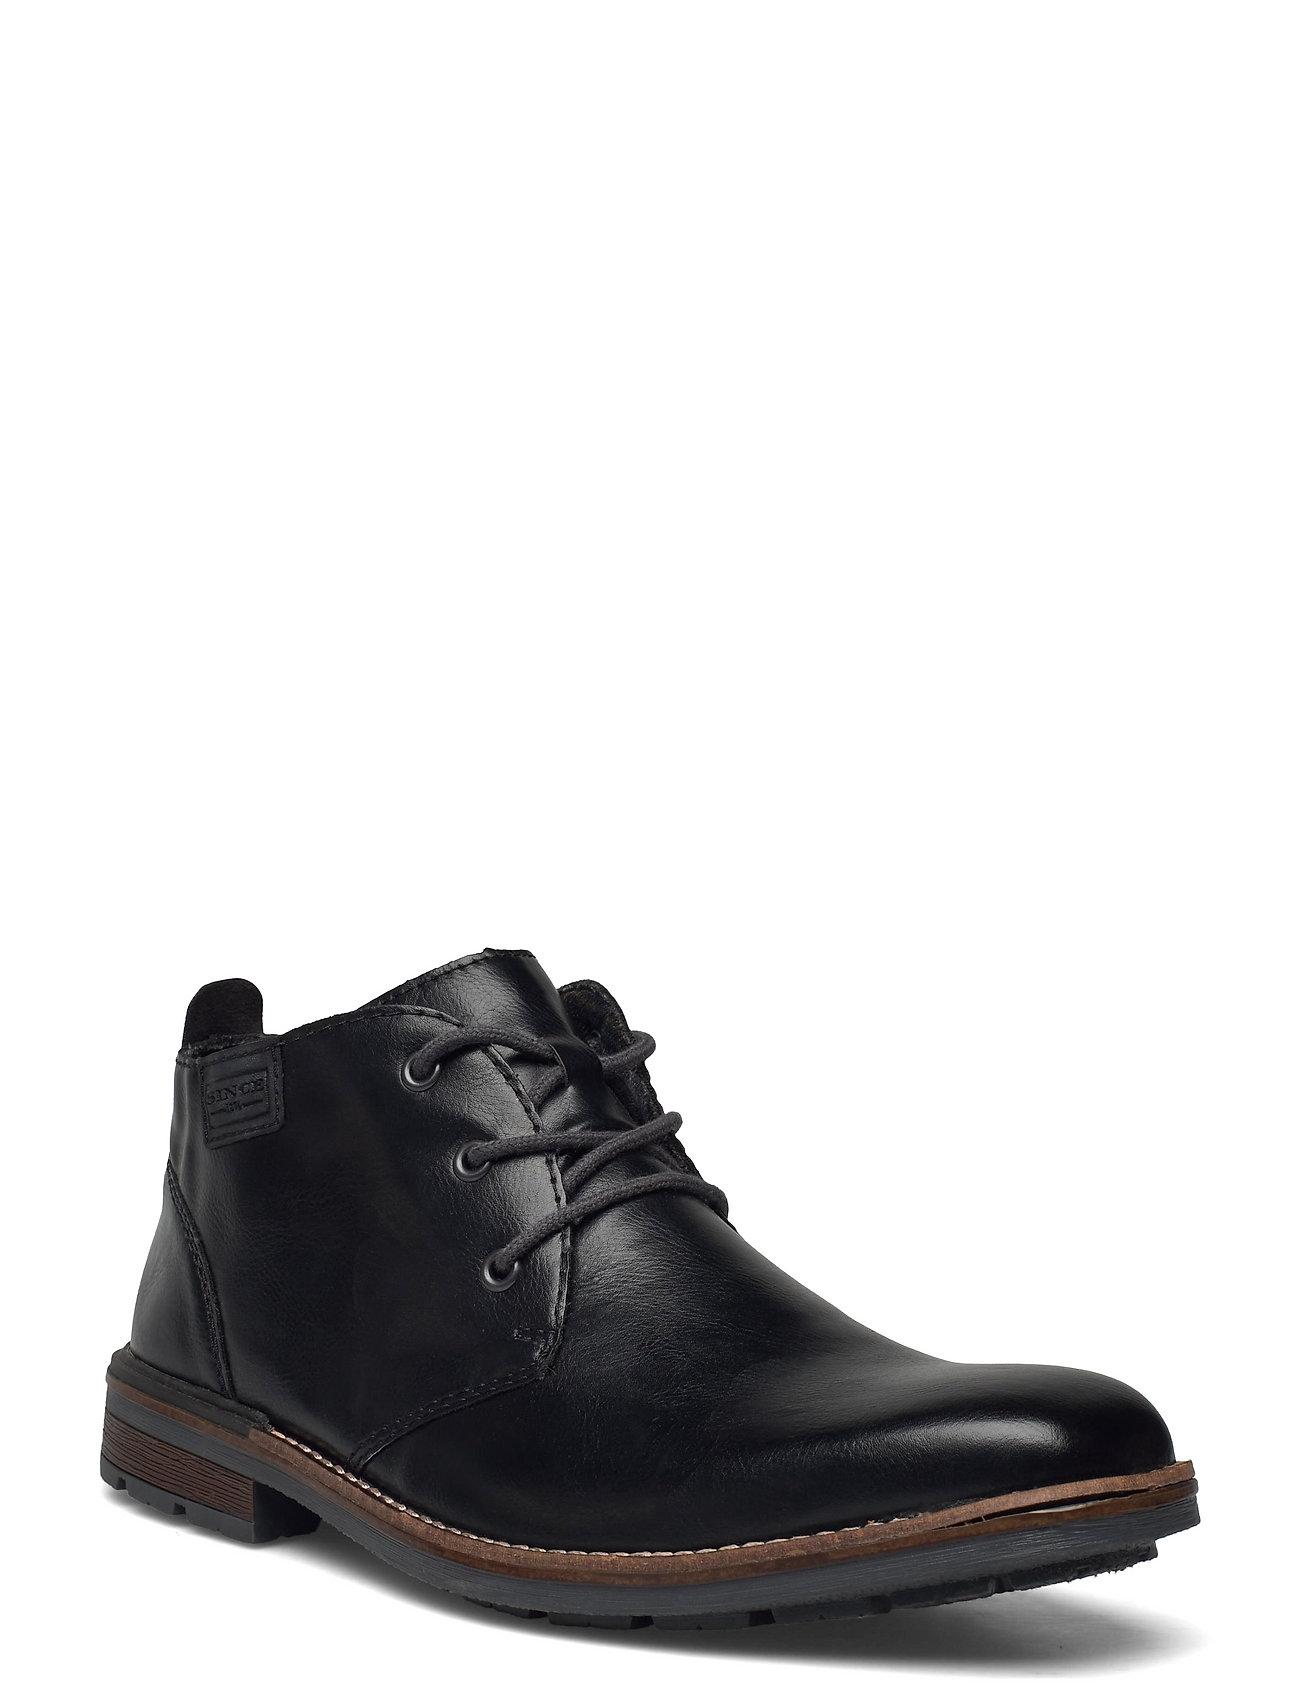 B1340-00 Shoes Business Laced Shoes Sort Rieker